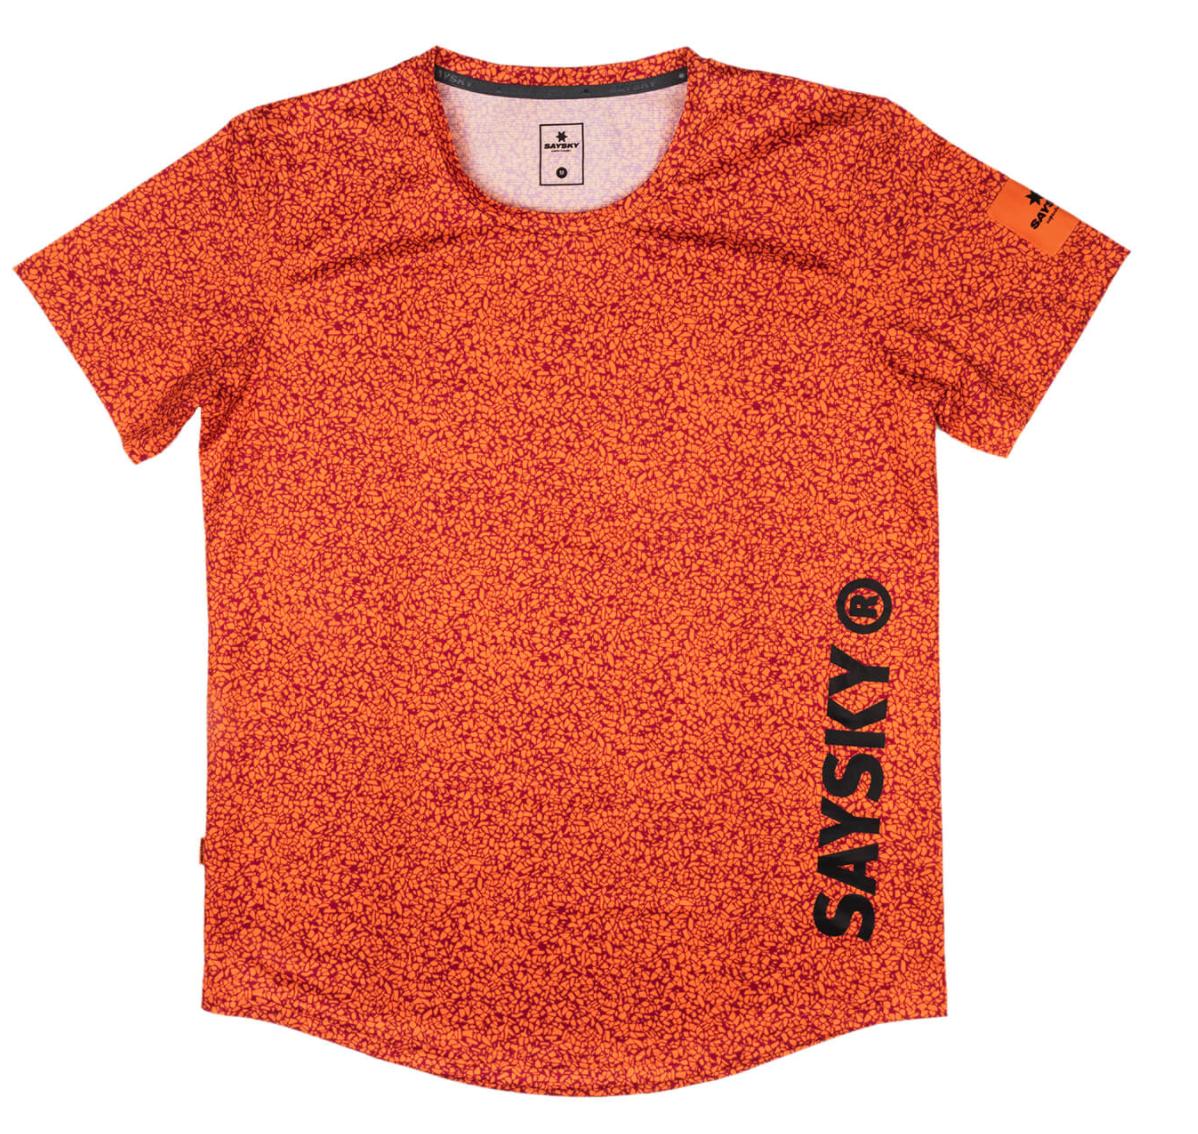 【10%OFF】SAYSKY ランニングTシャツ Terazzo Combat Tee - RED CLAY TERAZZO PRINT [ユニセックス] FMRSS21 2021S New Arrival Running T-shirts Unisex